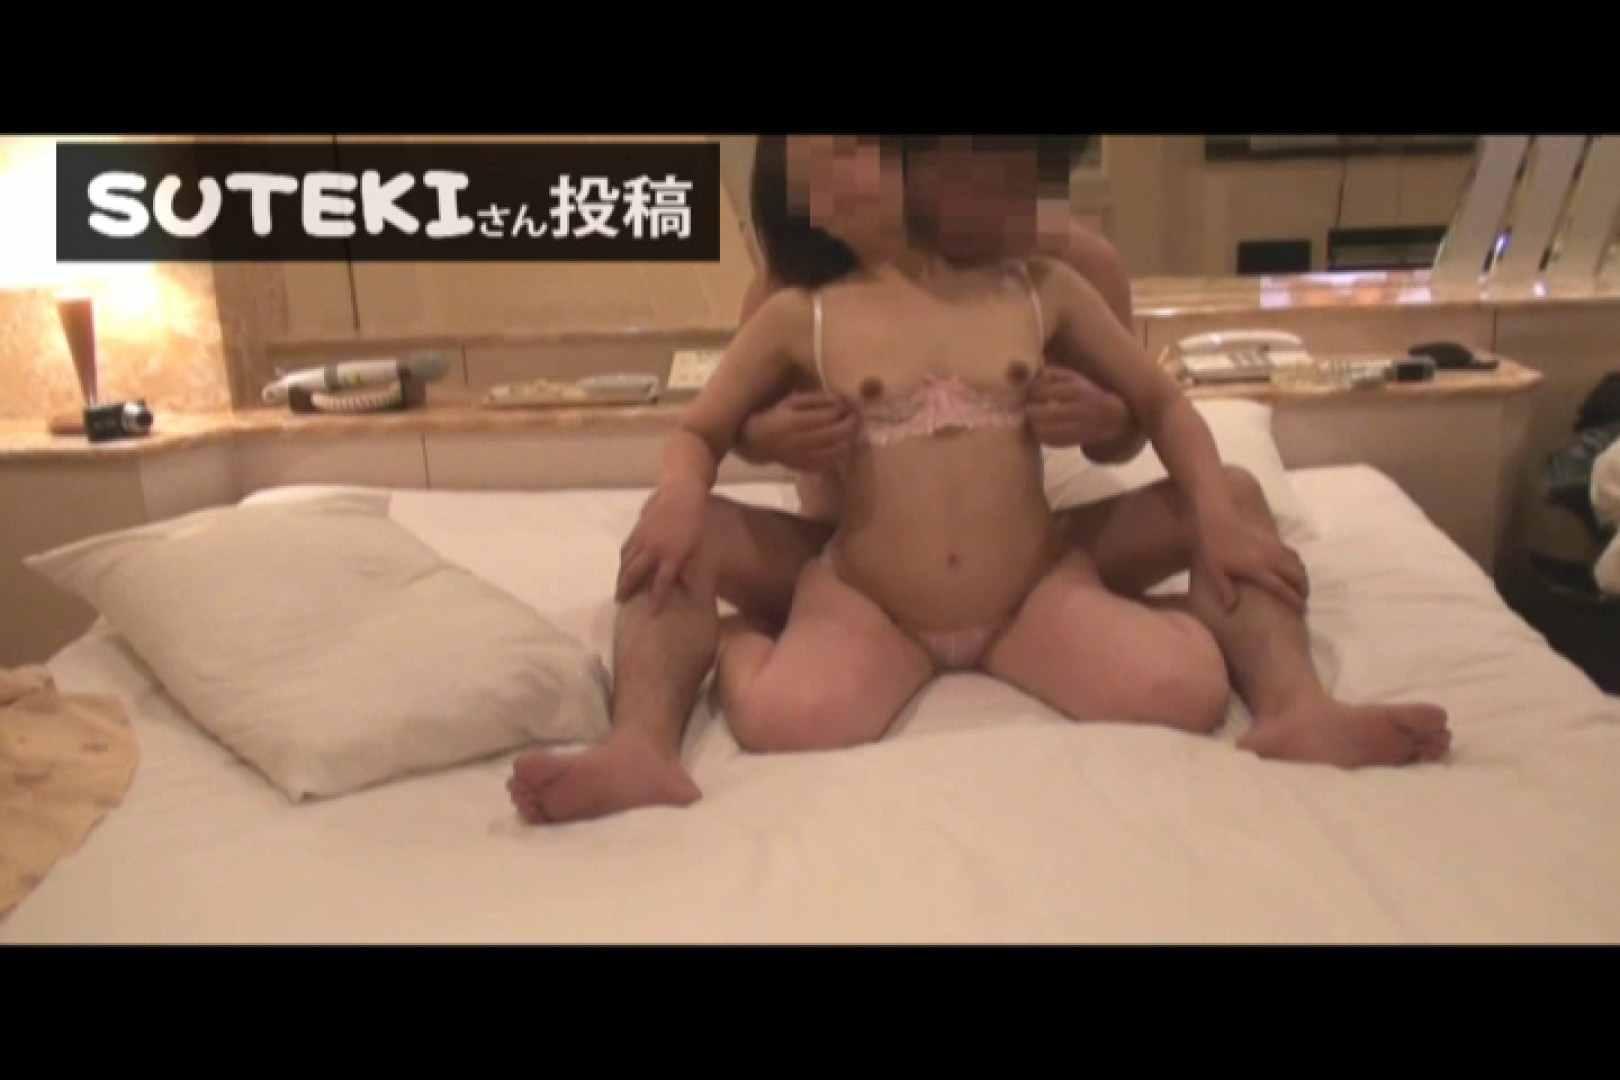 SUTEKIさん投稿 Hな記録、ピンクオープンブラ 投稿 SEX無修正画像 101pic 36